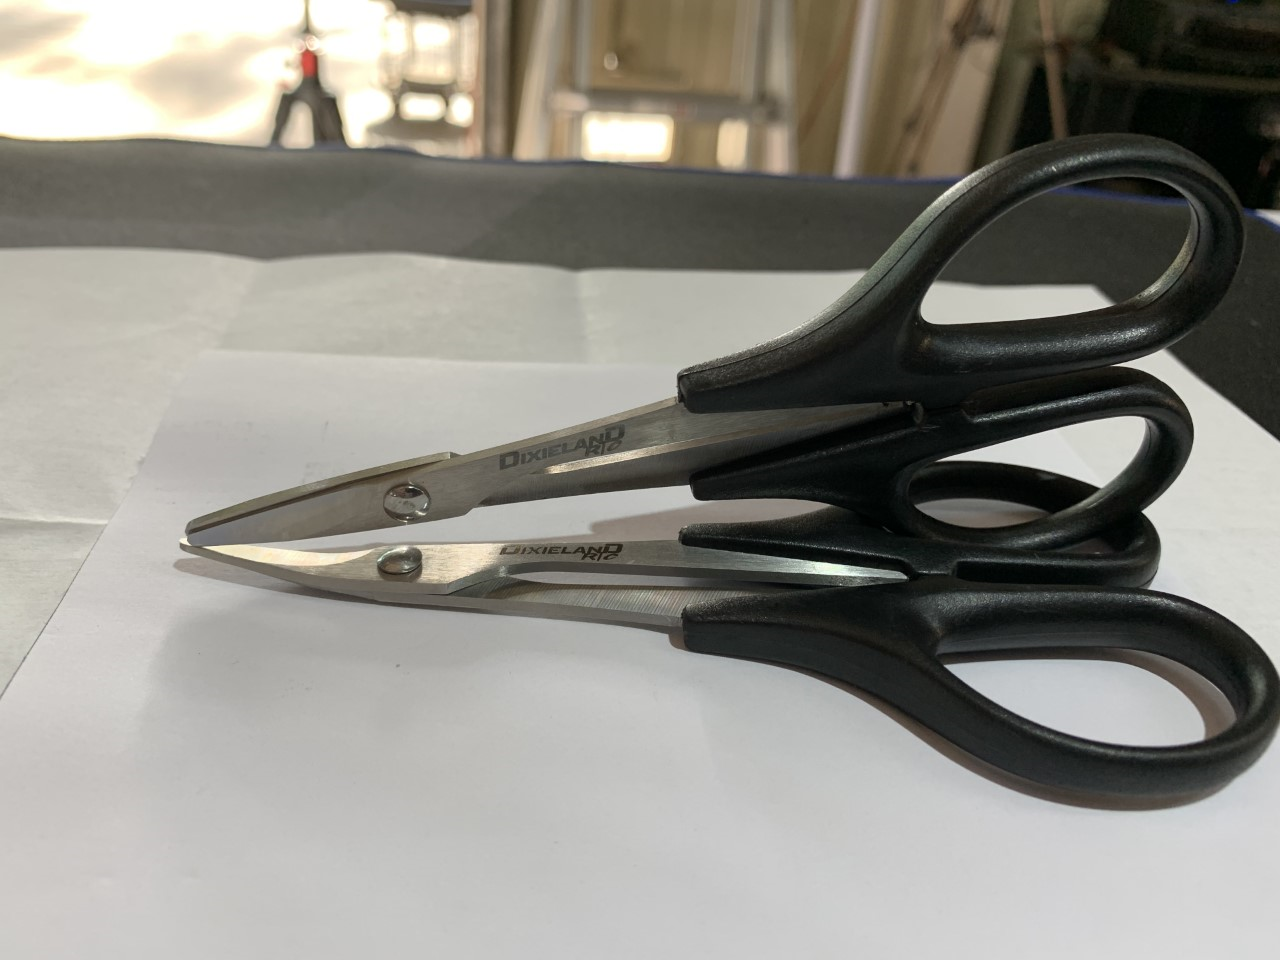 Dixieland R/C HSS Curved and Straight Scissor for Lexan